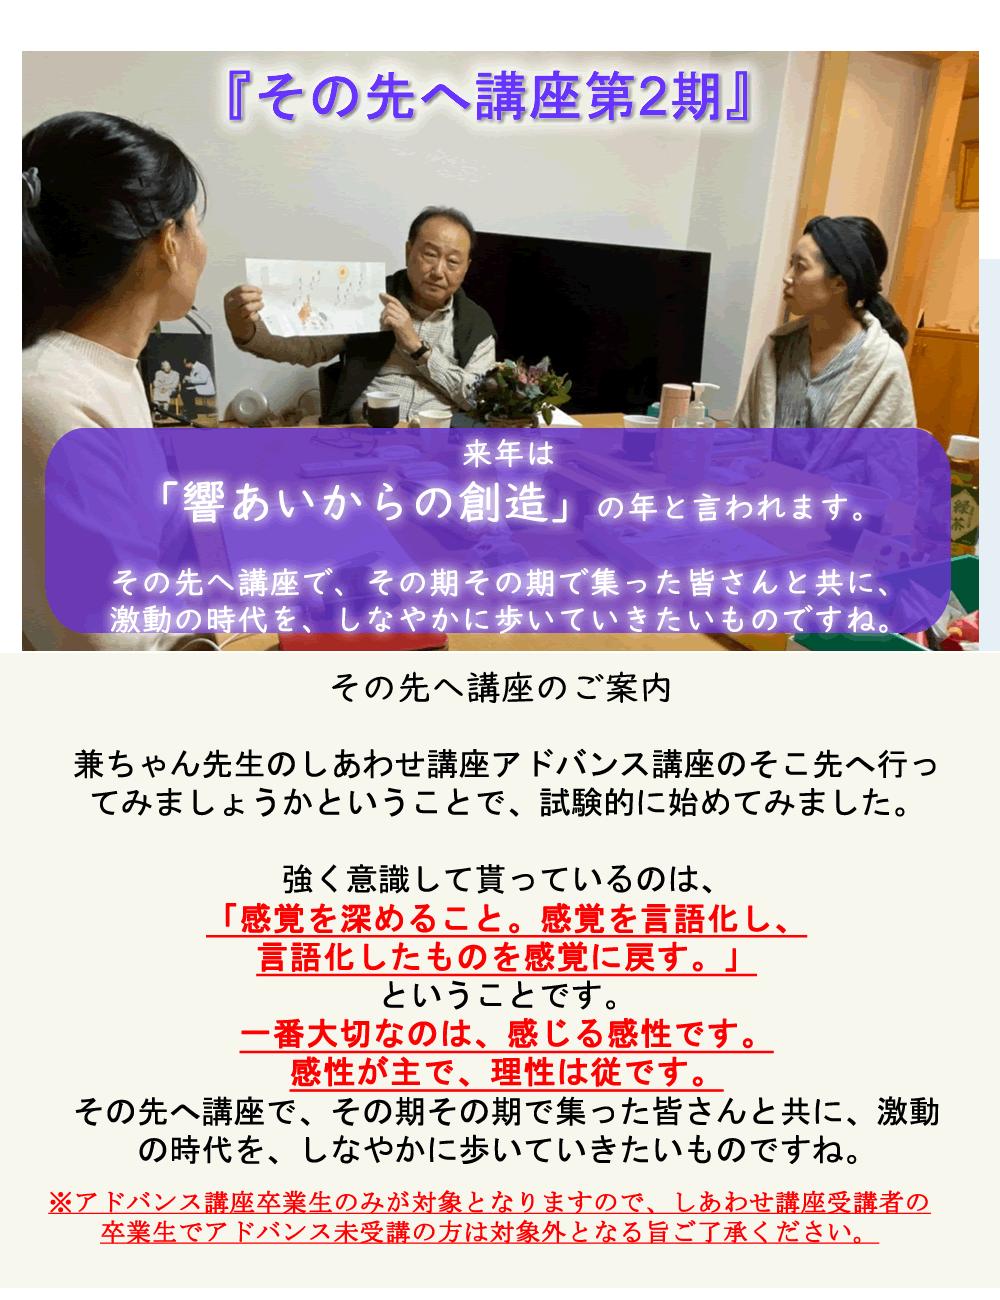 sonosakihe2 - その先へ講座第2期参加申し込み